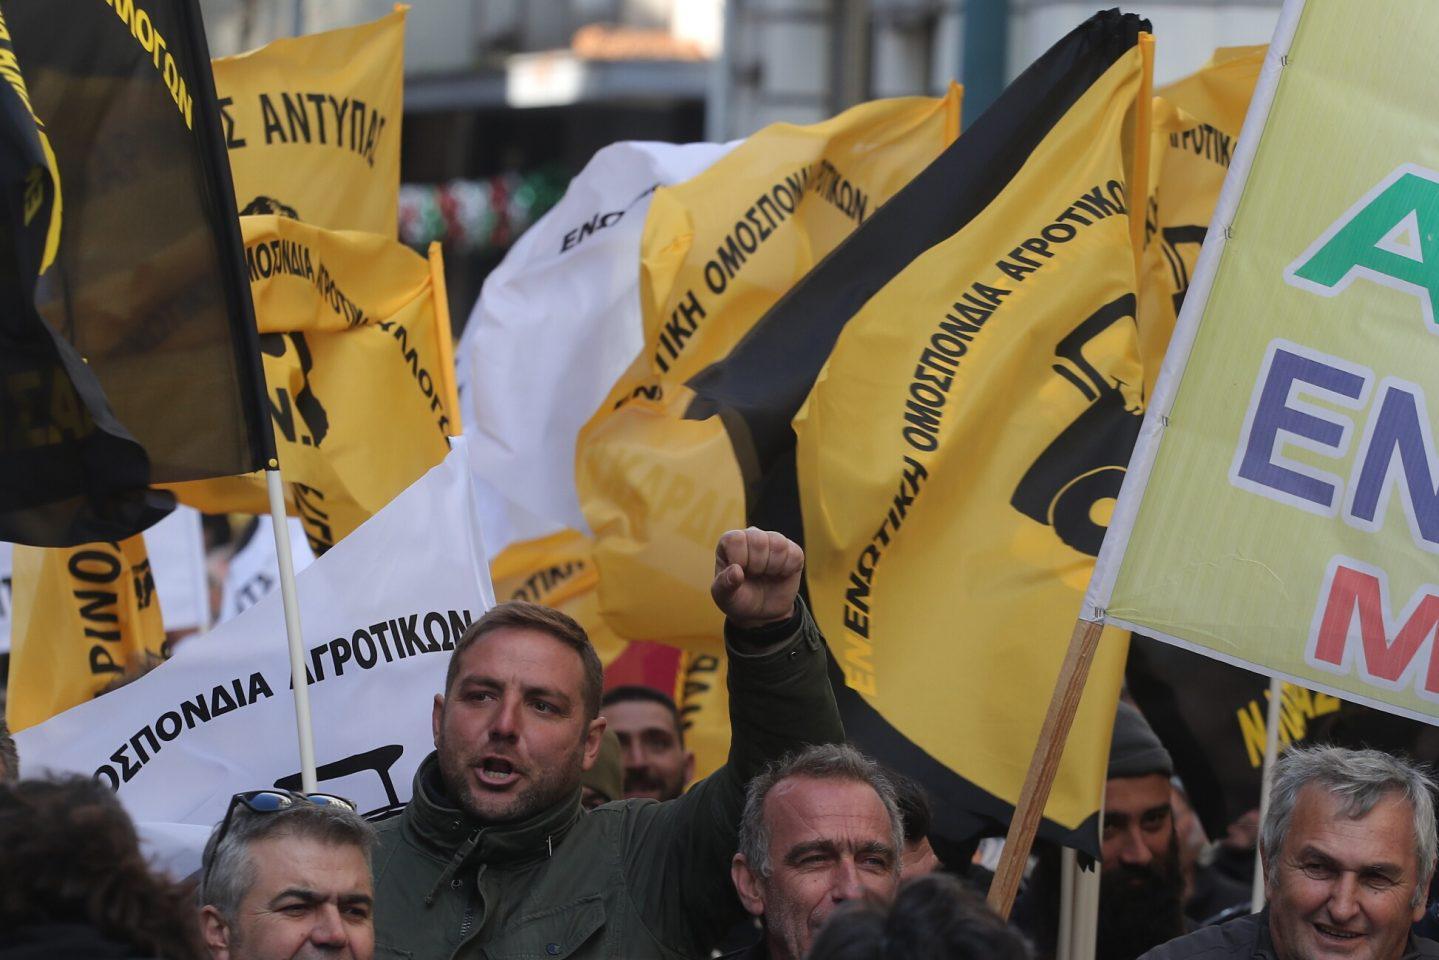 agrotes6-500 Ολοκληρώθηκε το παναγροτικό συλλαλητήριο [εικόνες]